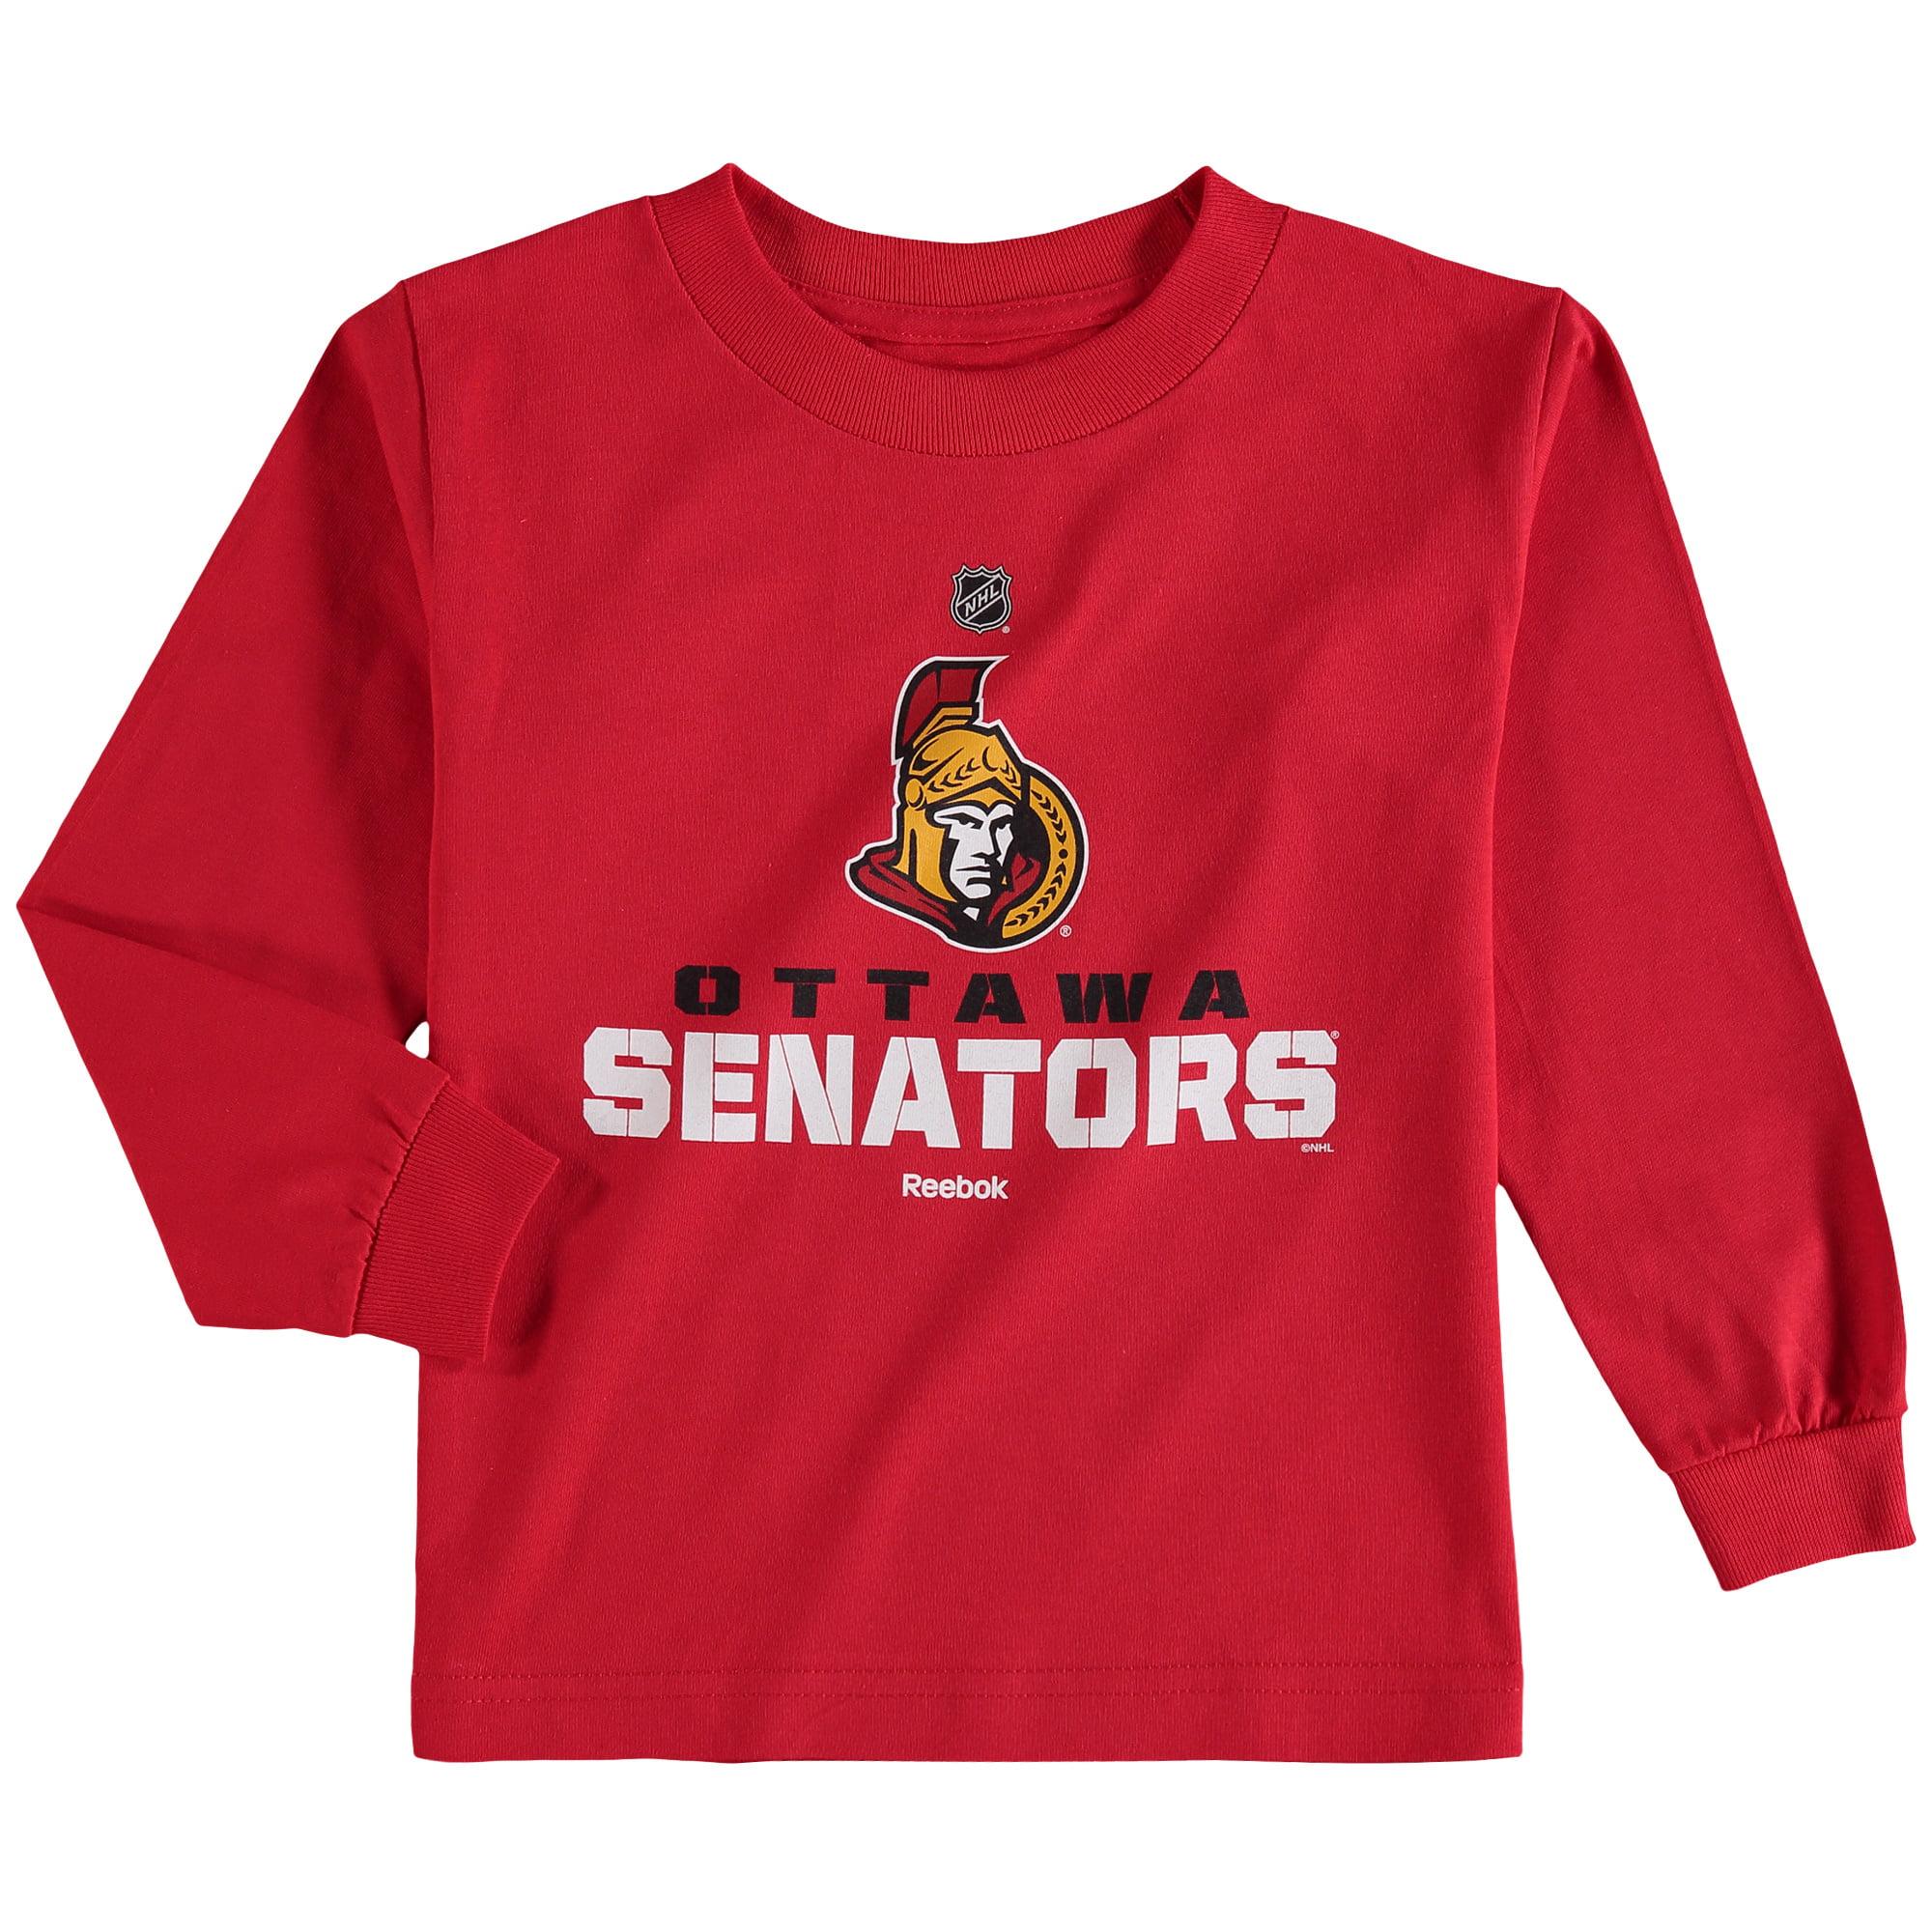 Ottawa Senators Reebok Preschool Clean Cut Long Sleeve T-Shirt - Red